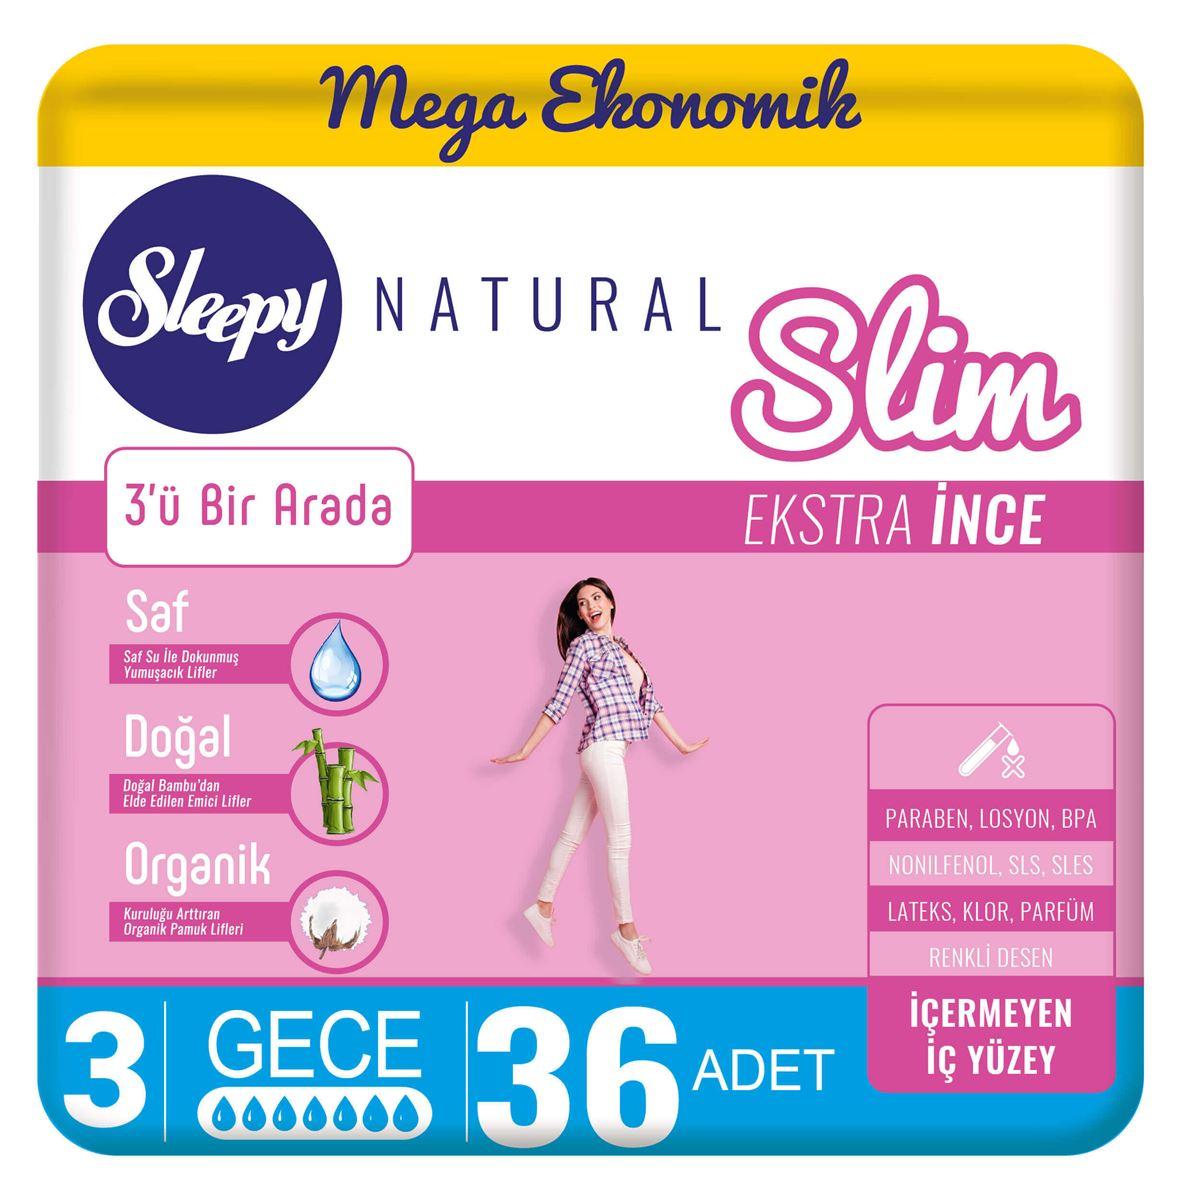 Sleepy Natural Slim Ekstra İnce Gece(36 Ped)